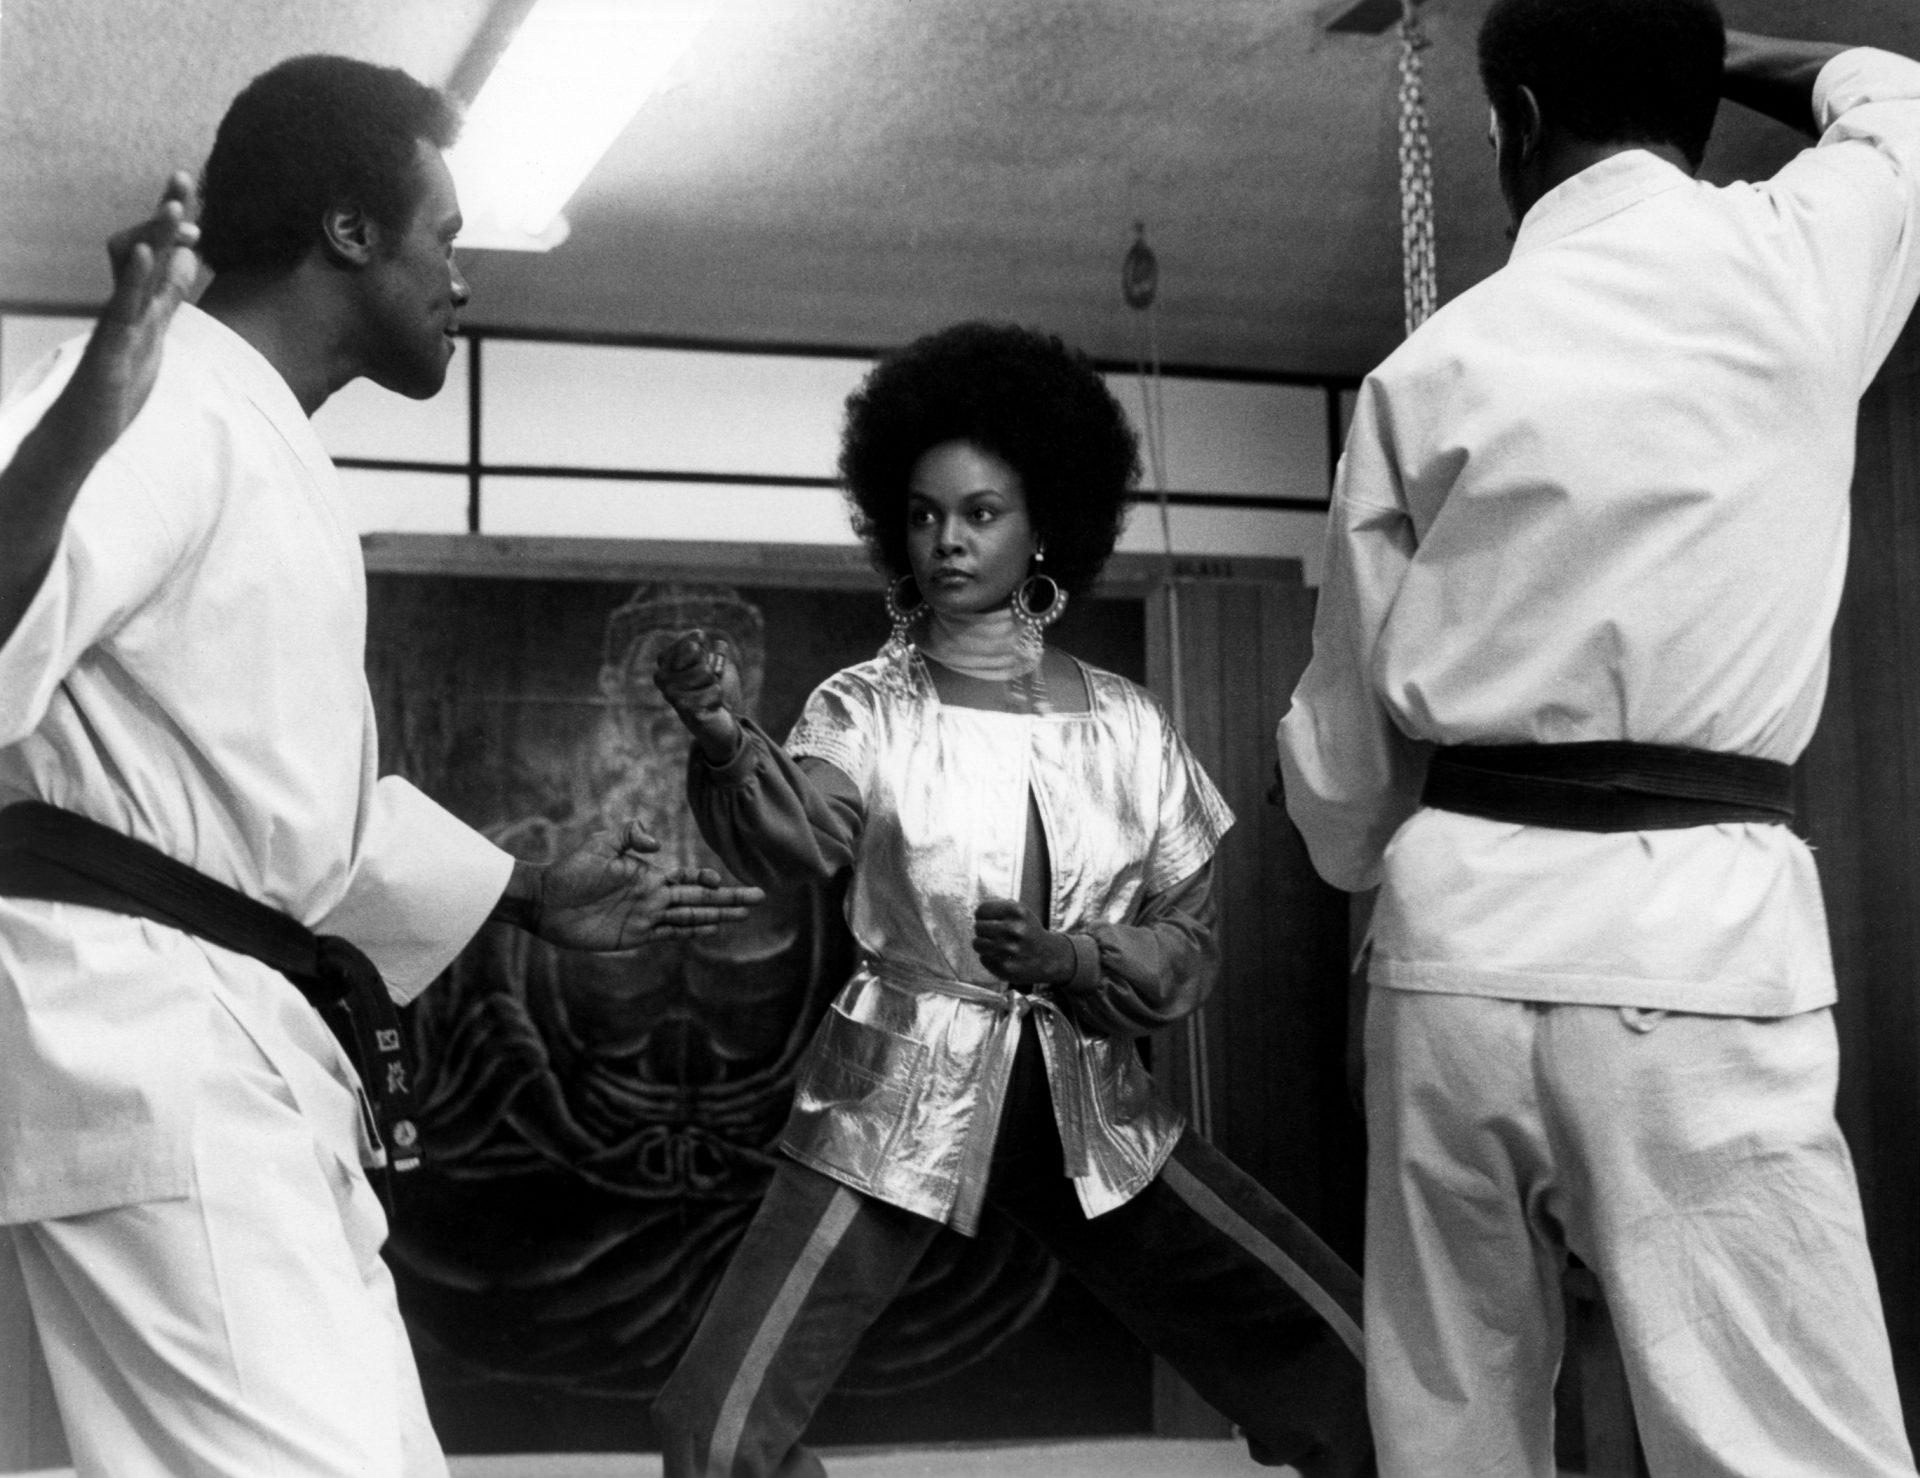 Albert Popewell, Tamara Dobson, and Caro Kenyatta in Cleopatra Jones, 1973. Directed by Jack Starrett (American, 1936–1989). Warner Bros. Film Study Center Special Collections, The Museum of Modern Art.